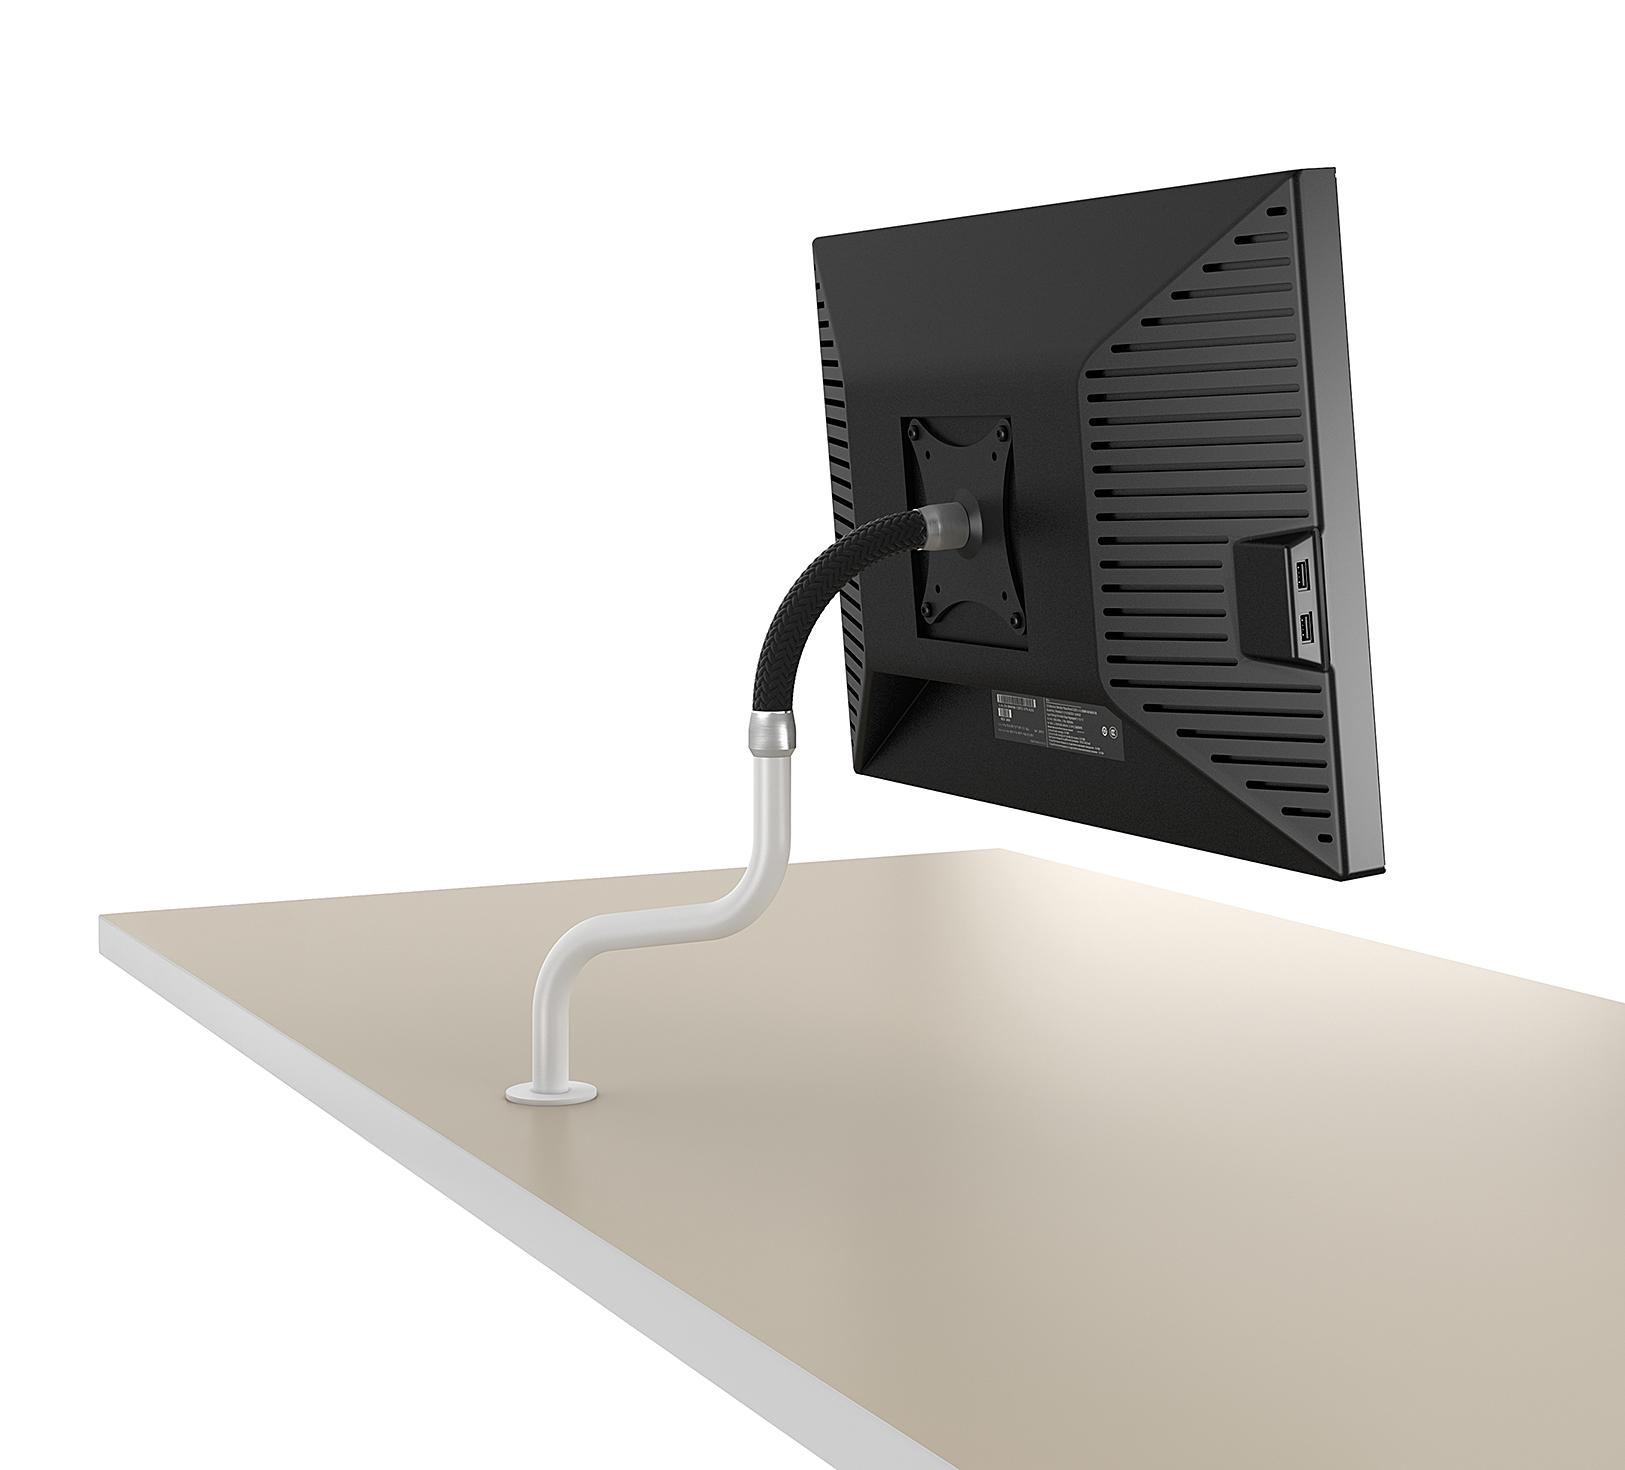 Accessoires de bureau Ubia mobilier bureau BRAS SUPPORT ECRAN 3